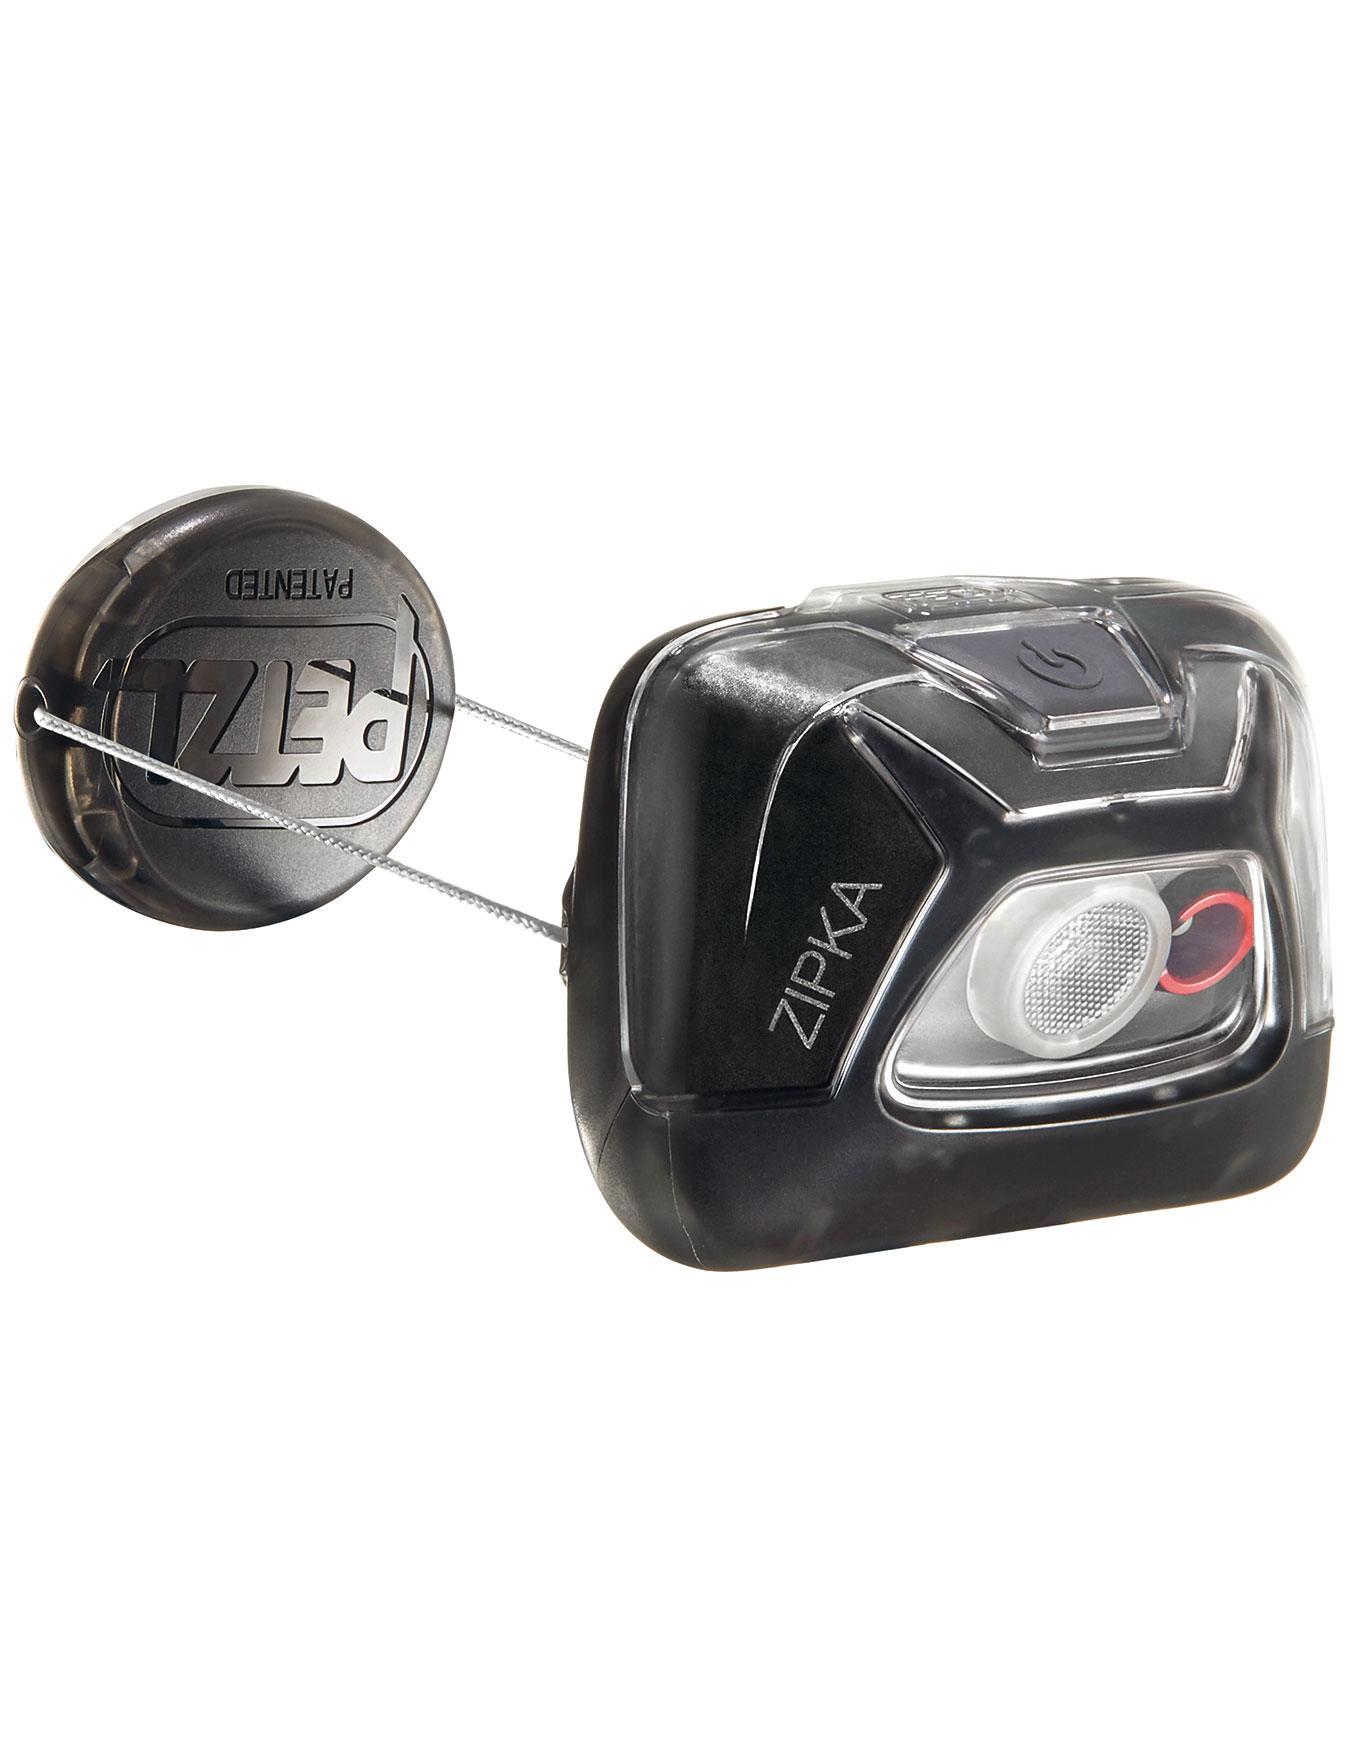 Lampe frontale LED Petzl Zipka